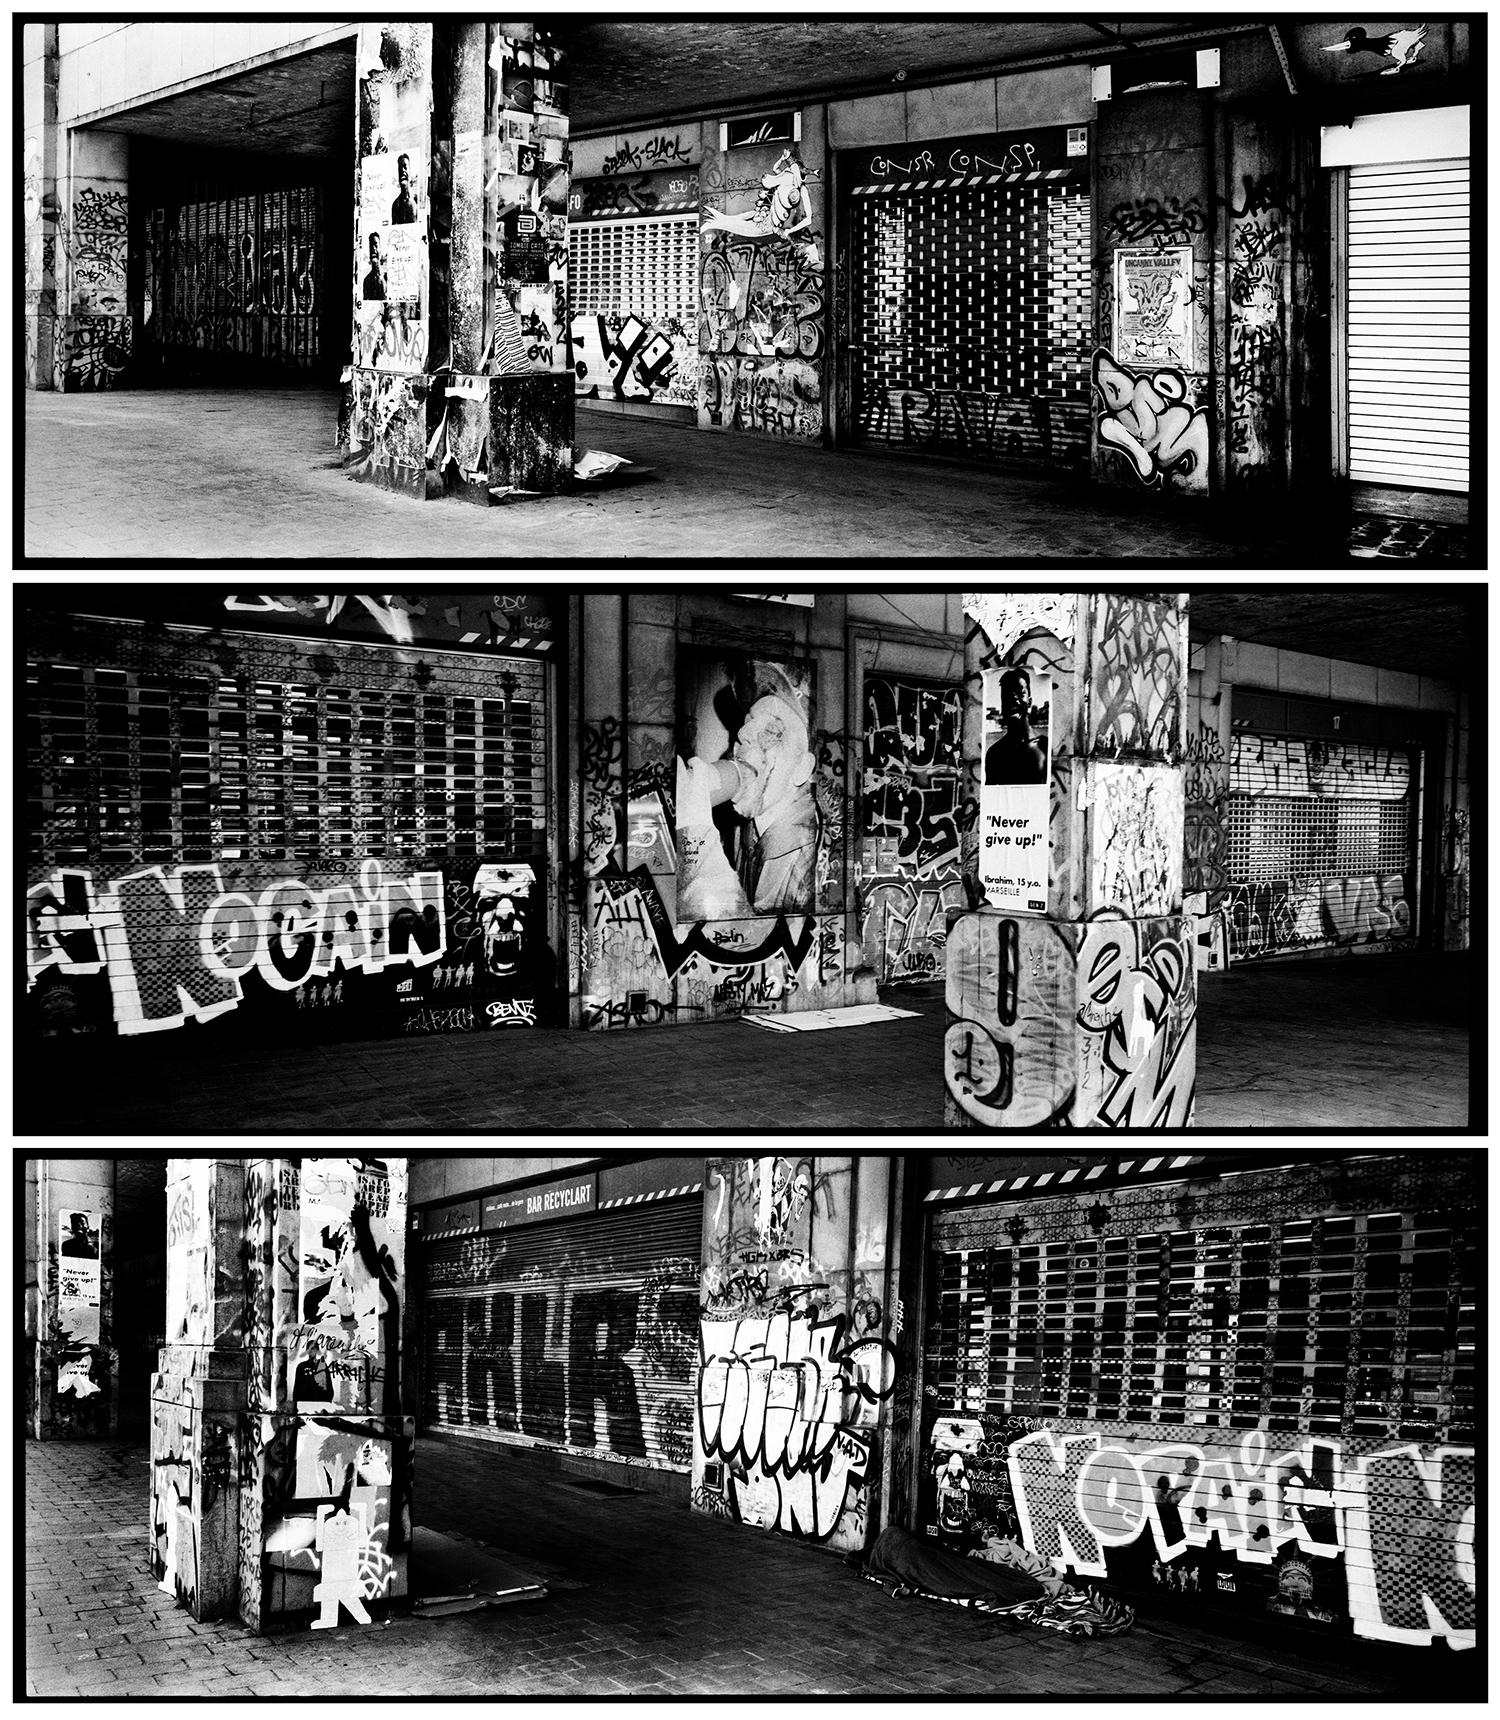 Brussels, Belgium by Laurent Orseau #9